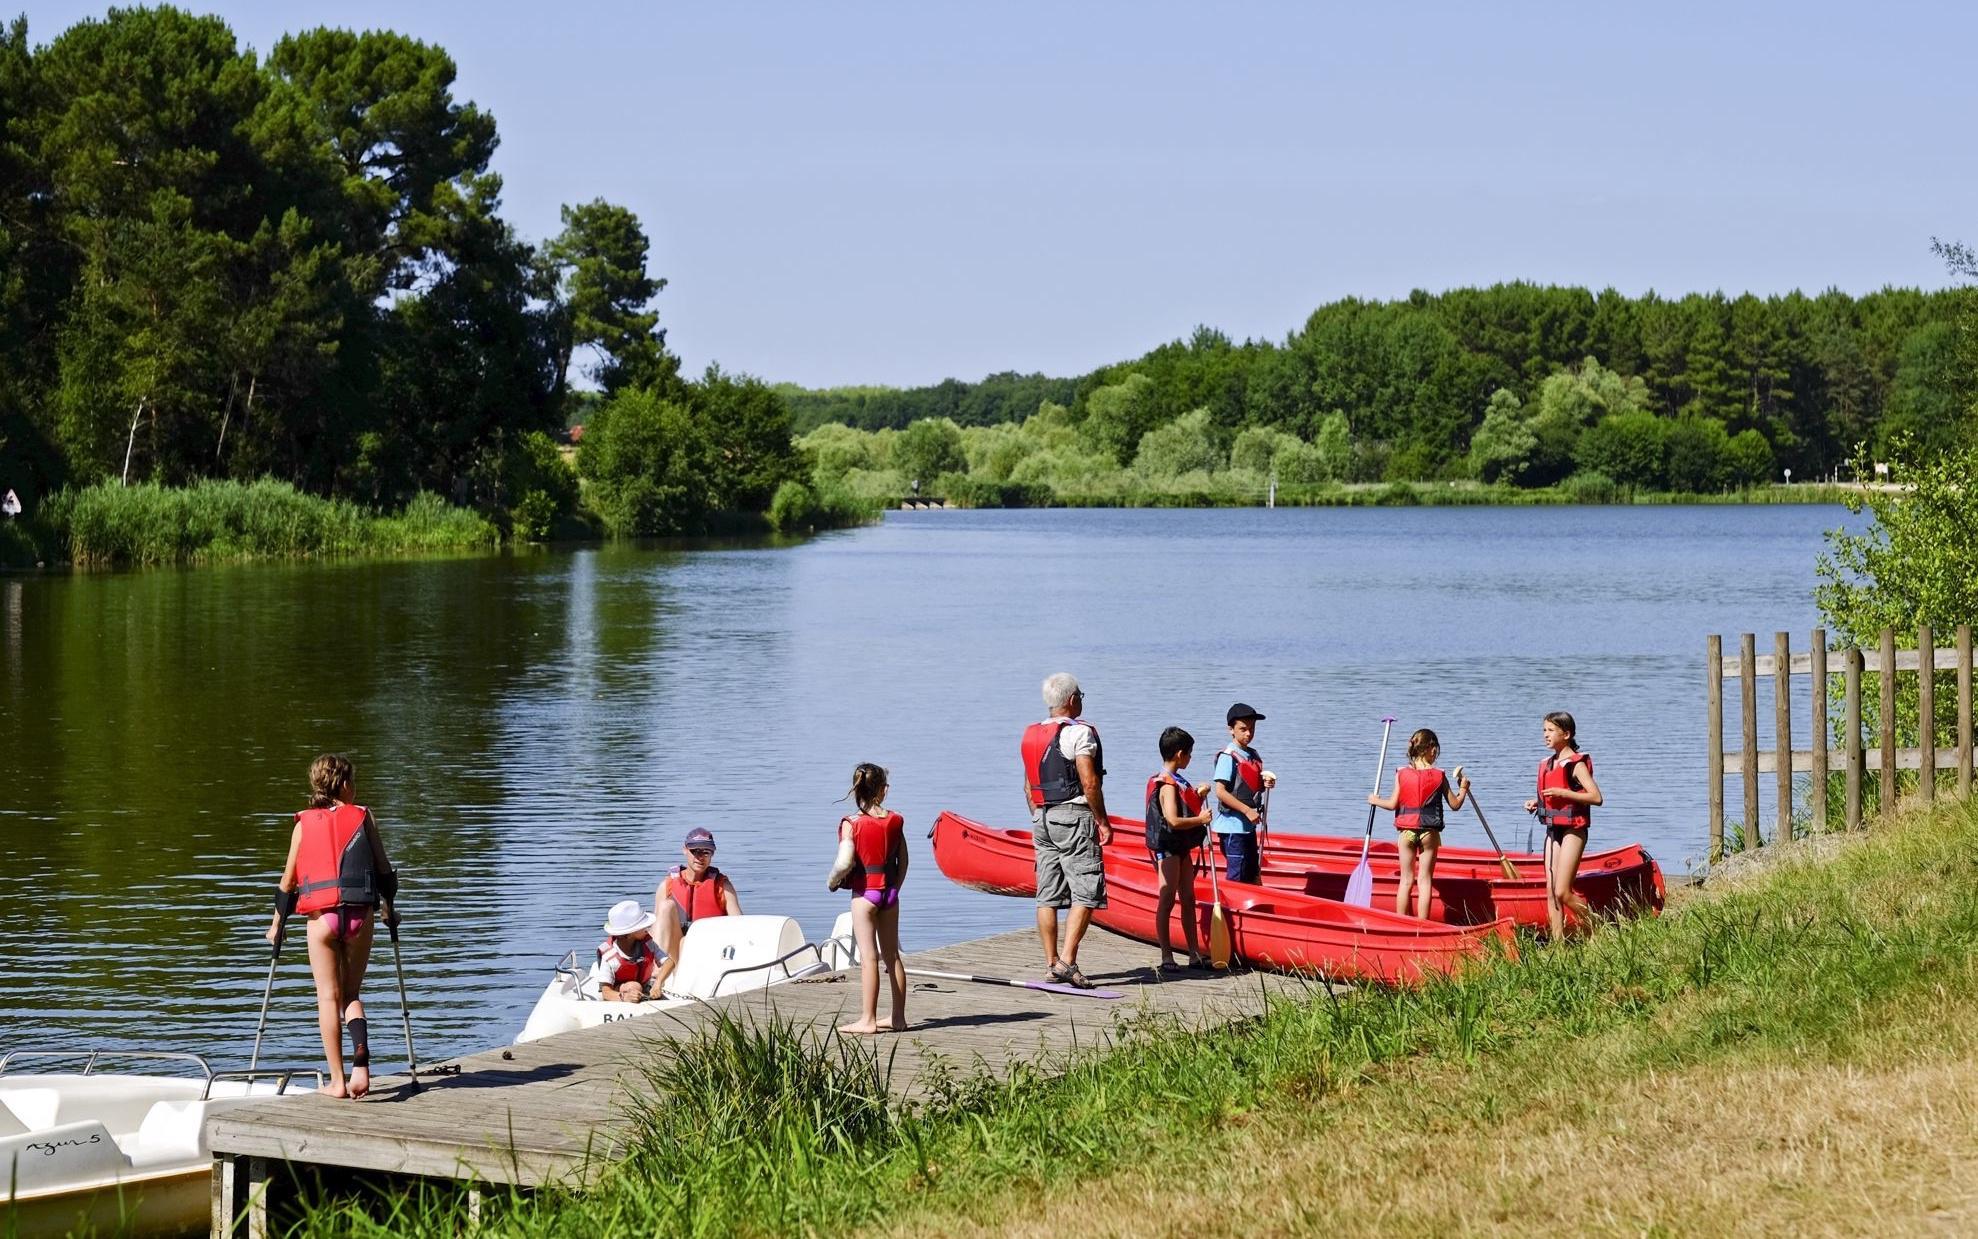 Campsites in Indre-et-Loire, France